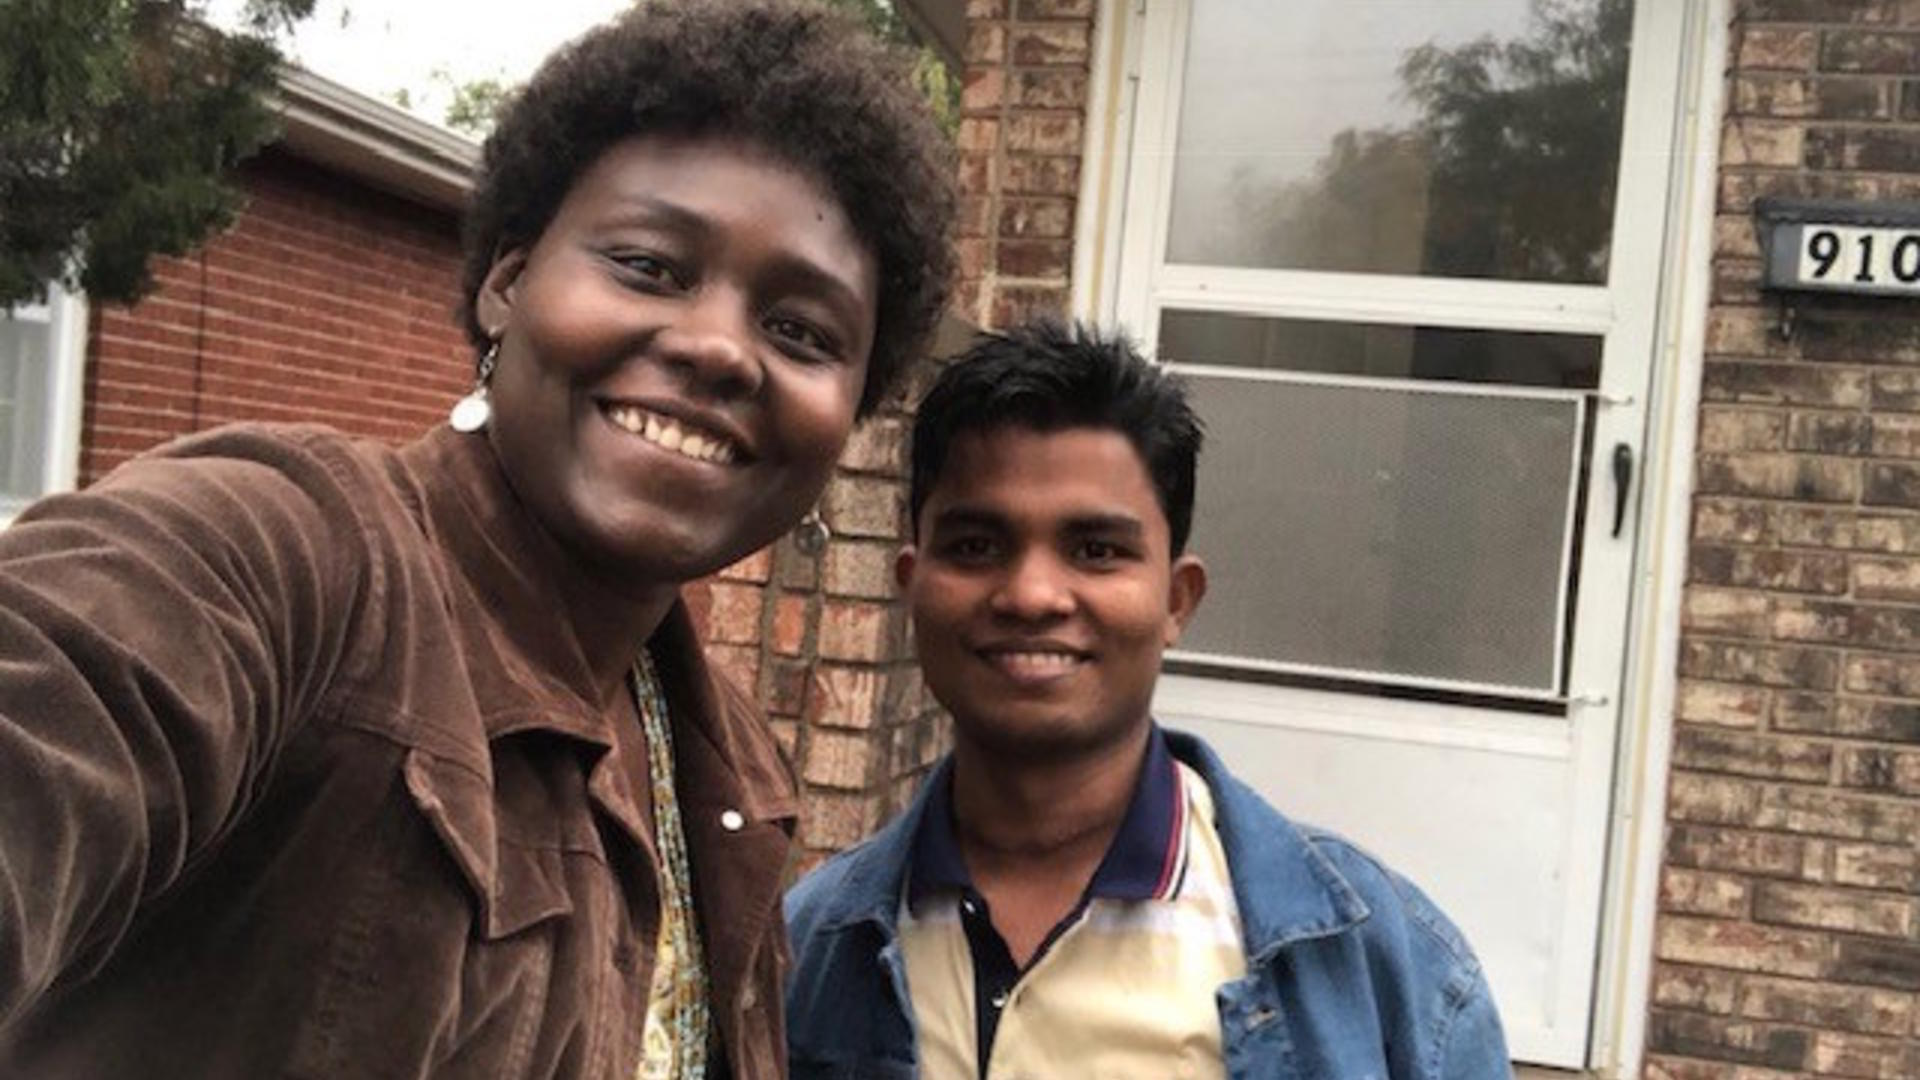 IRC staff member Amy Longa with Nor Kamel, a 19-year-old Rohingya refugee from Myanmar (Burma)